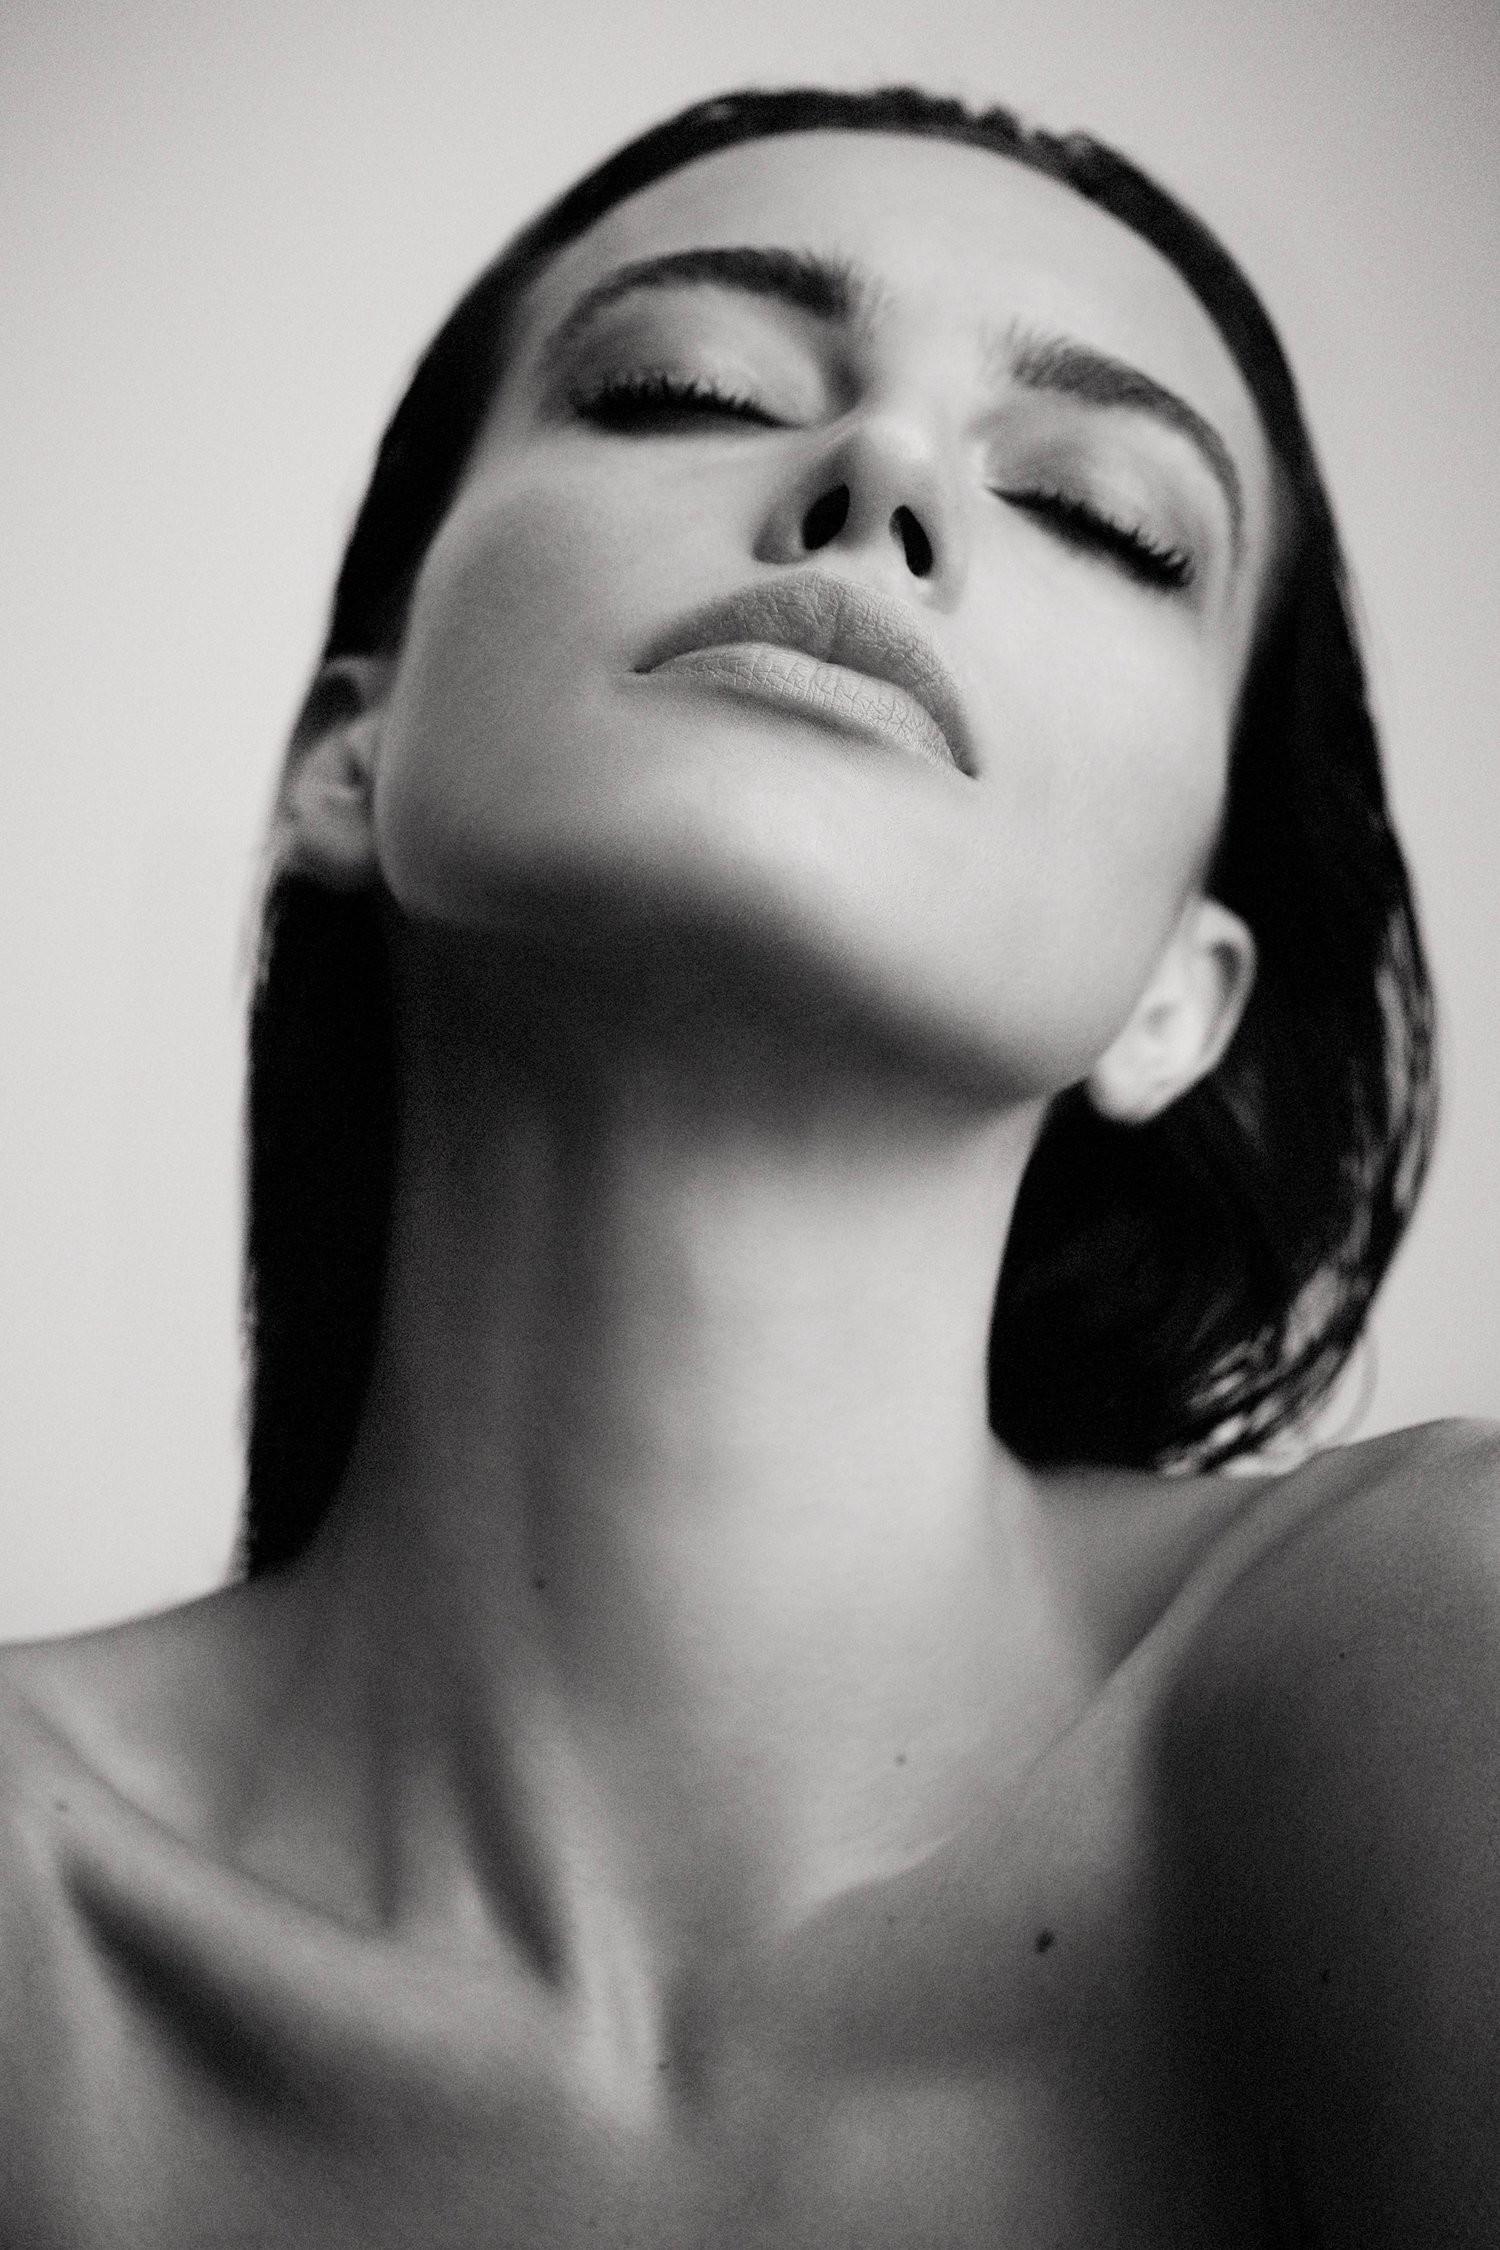 TheFappening Meri Gulin nudes (65 foto and video), Ass, Leaked, Instagram, in bikini 2006